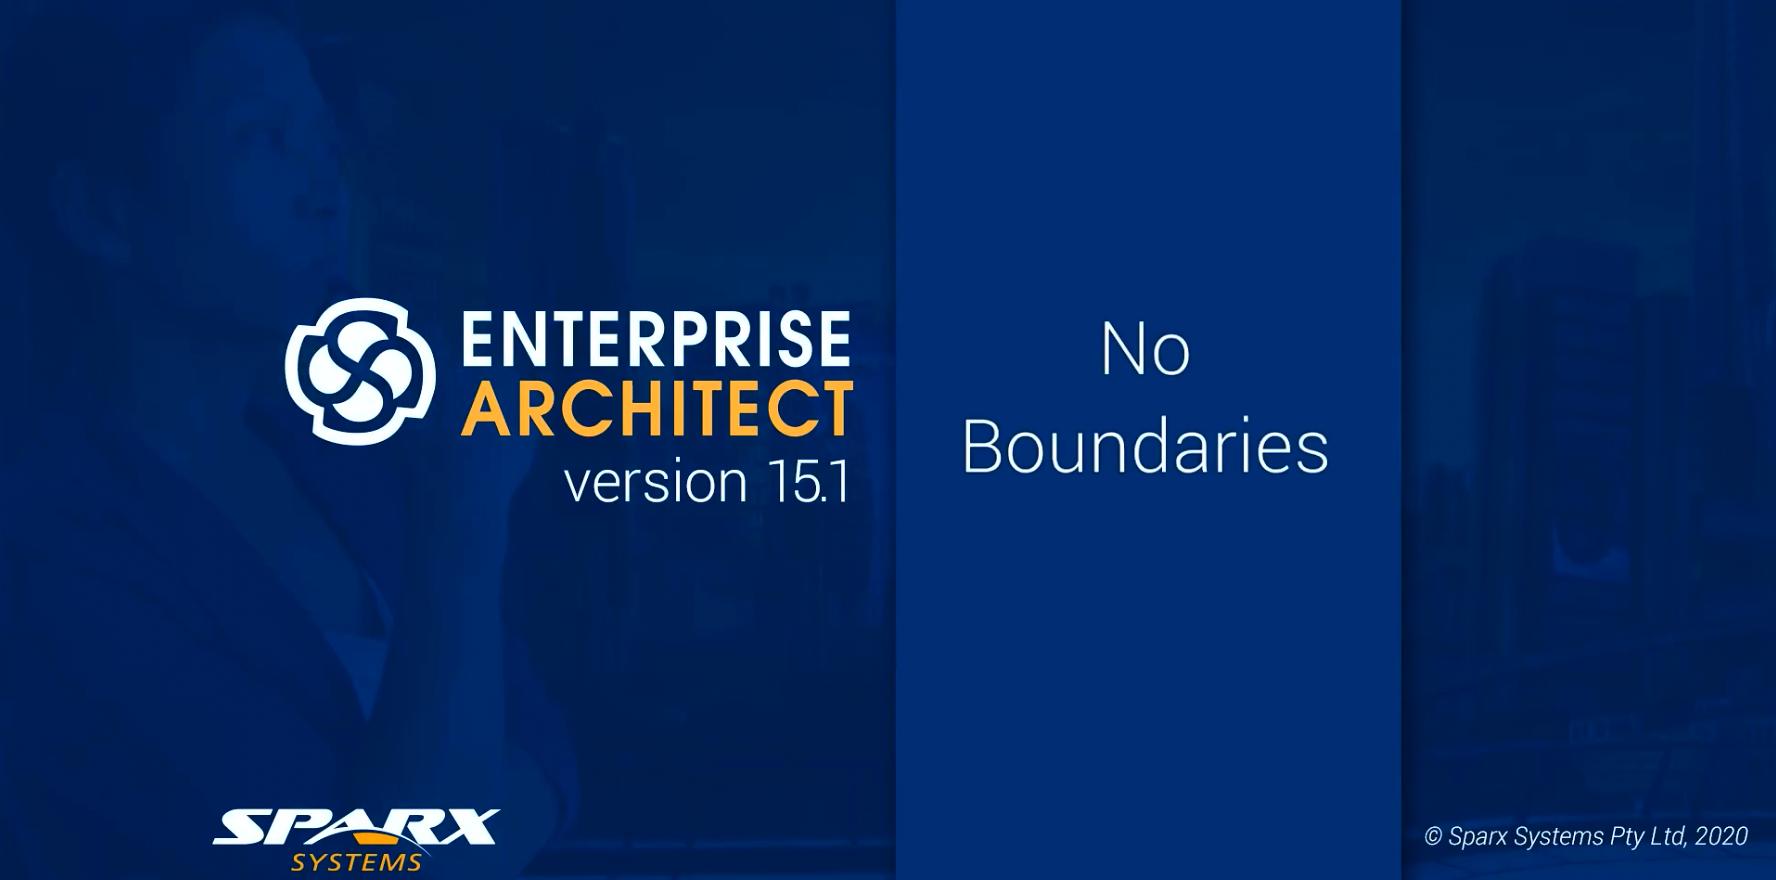 Enterprise Architect版本15.1功能解析(一):单个工具跨领域进行分析